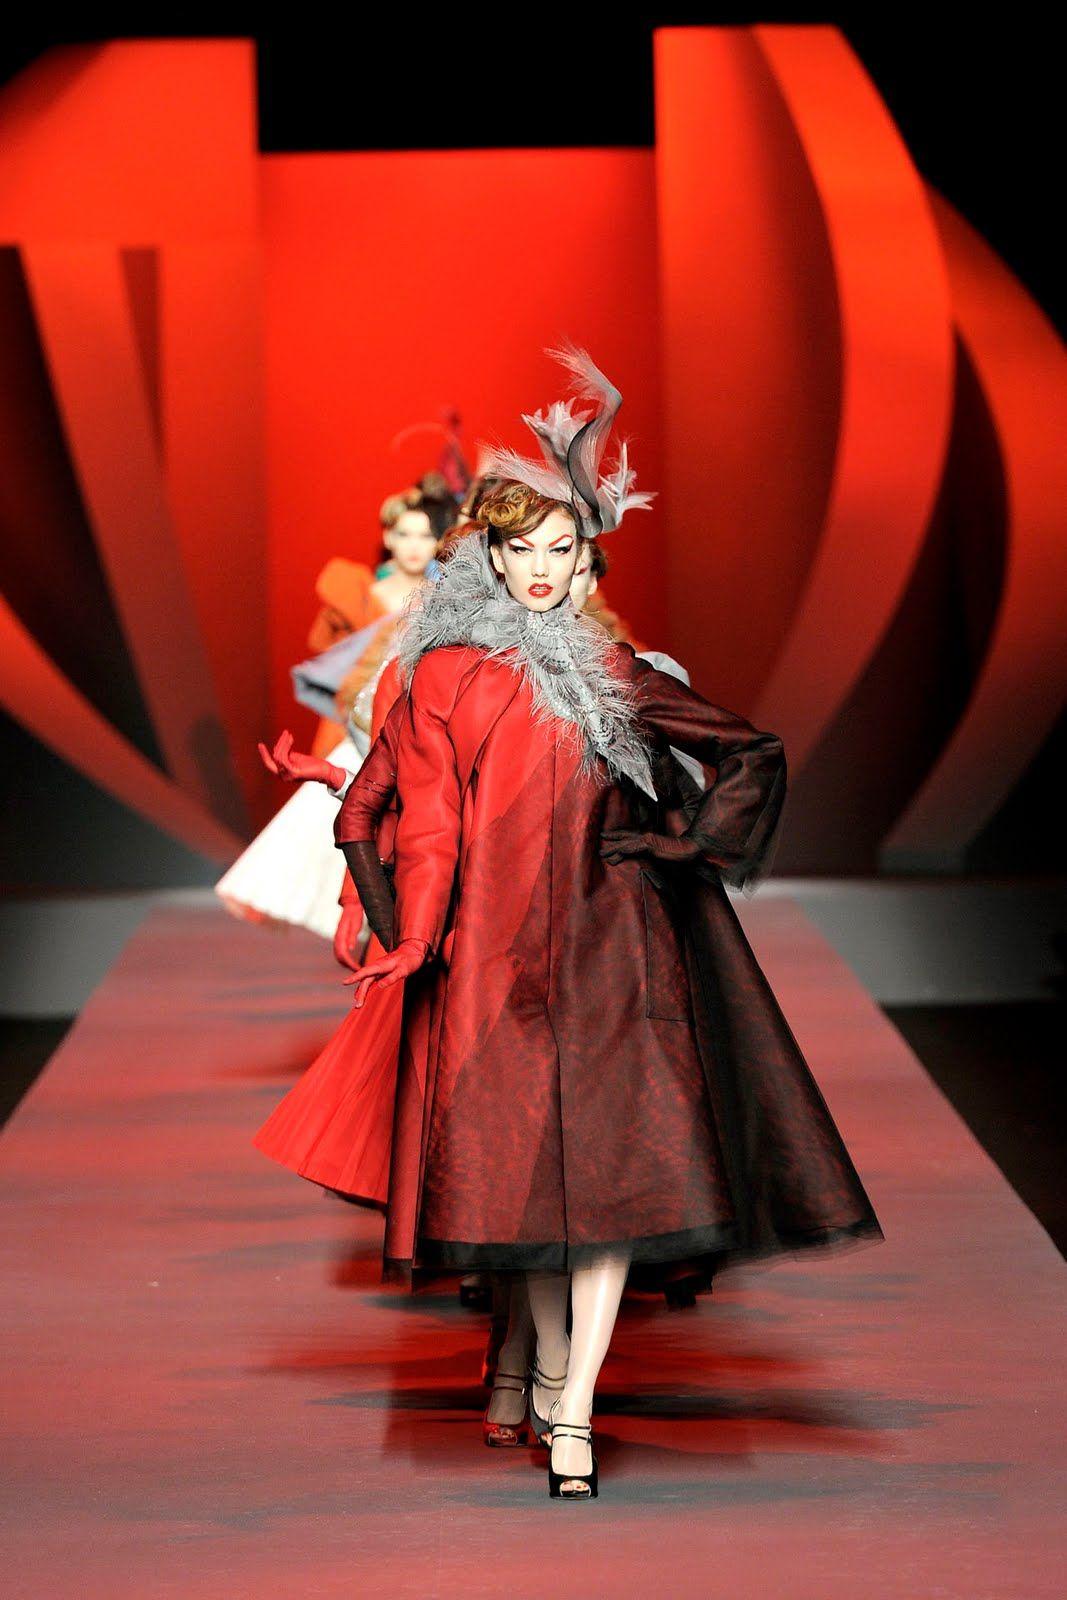 Christian Dior Haute Couture | Paris Haute Couture Fashion Week| Christian Dior S/S 2011!